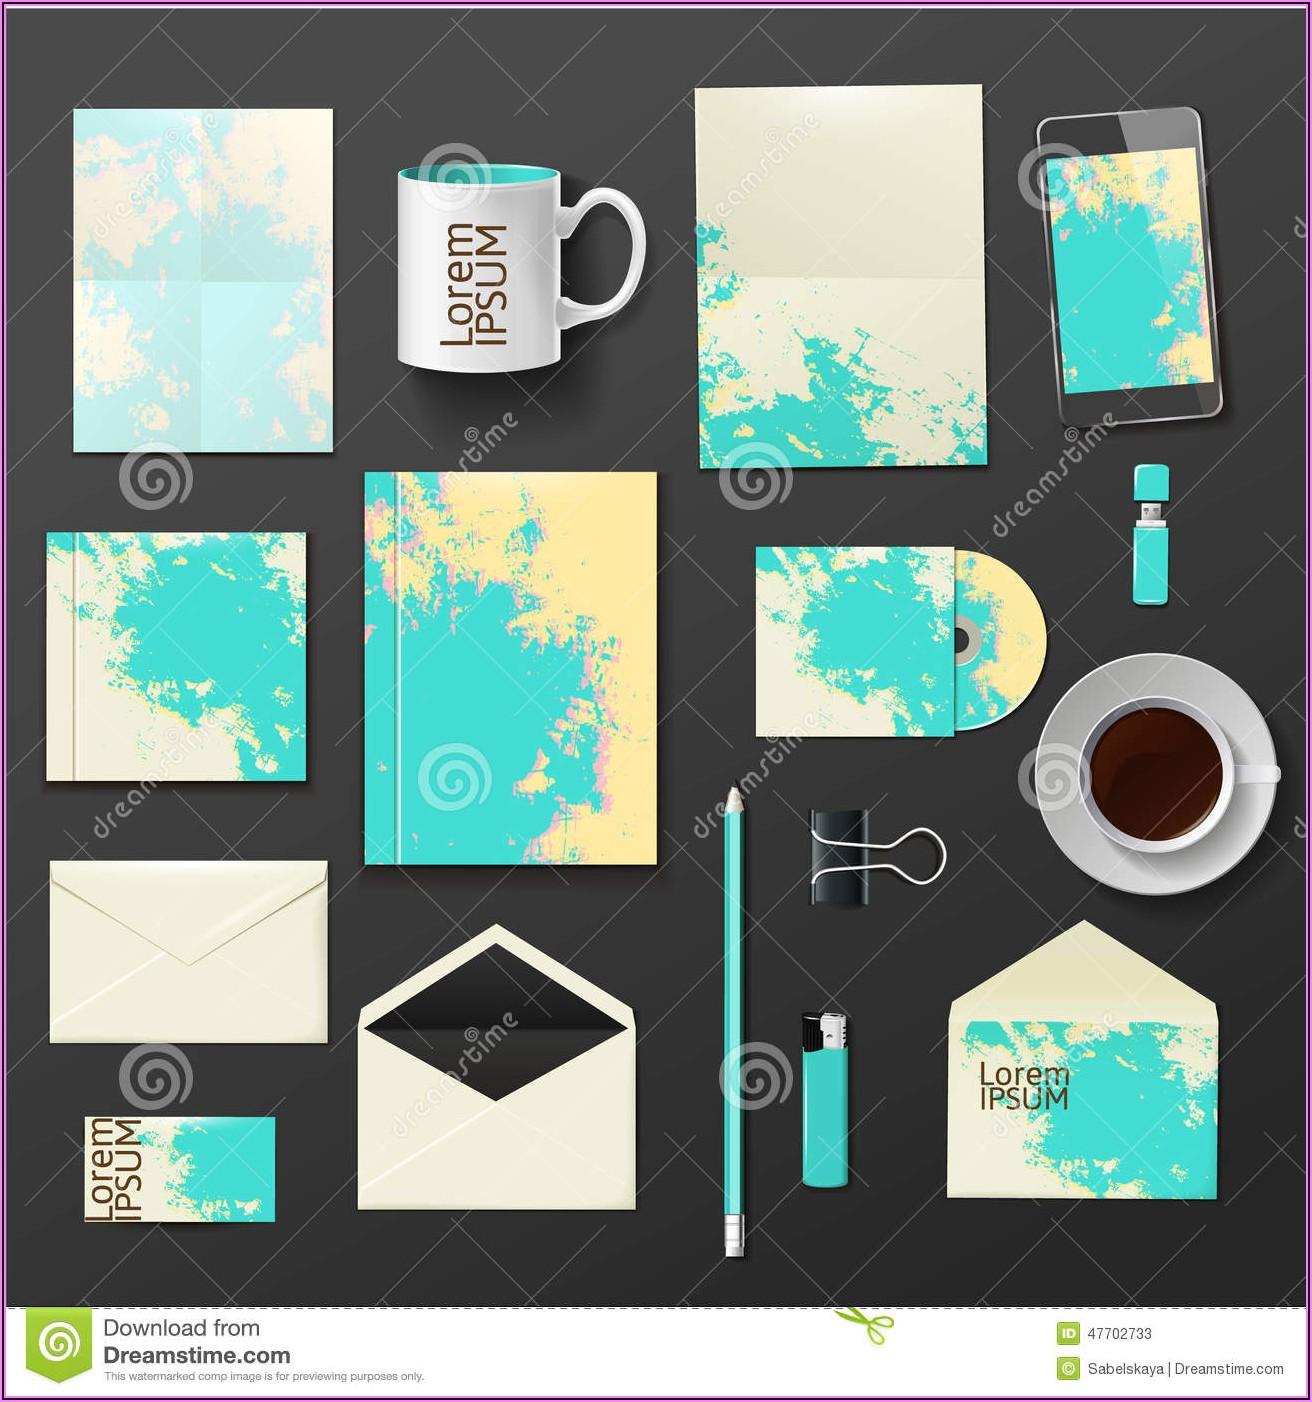 Company Envelope Design Template